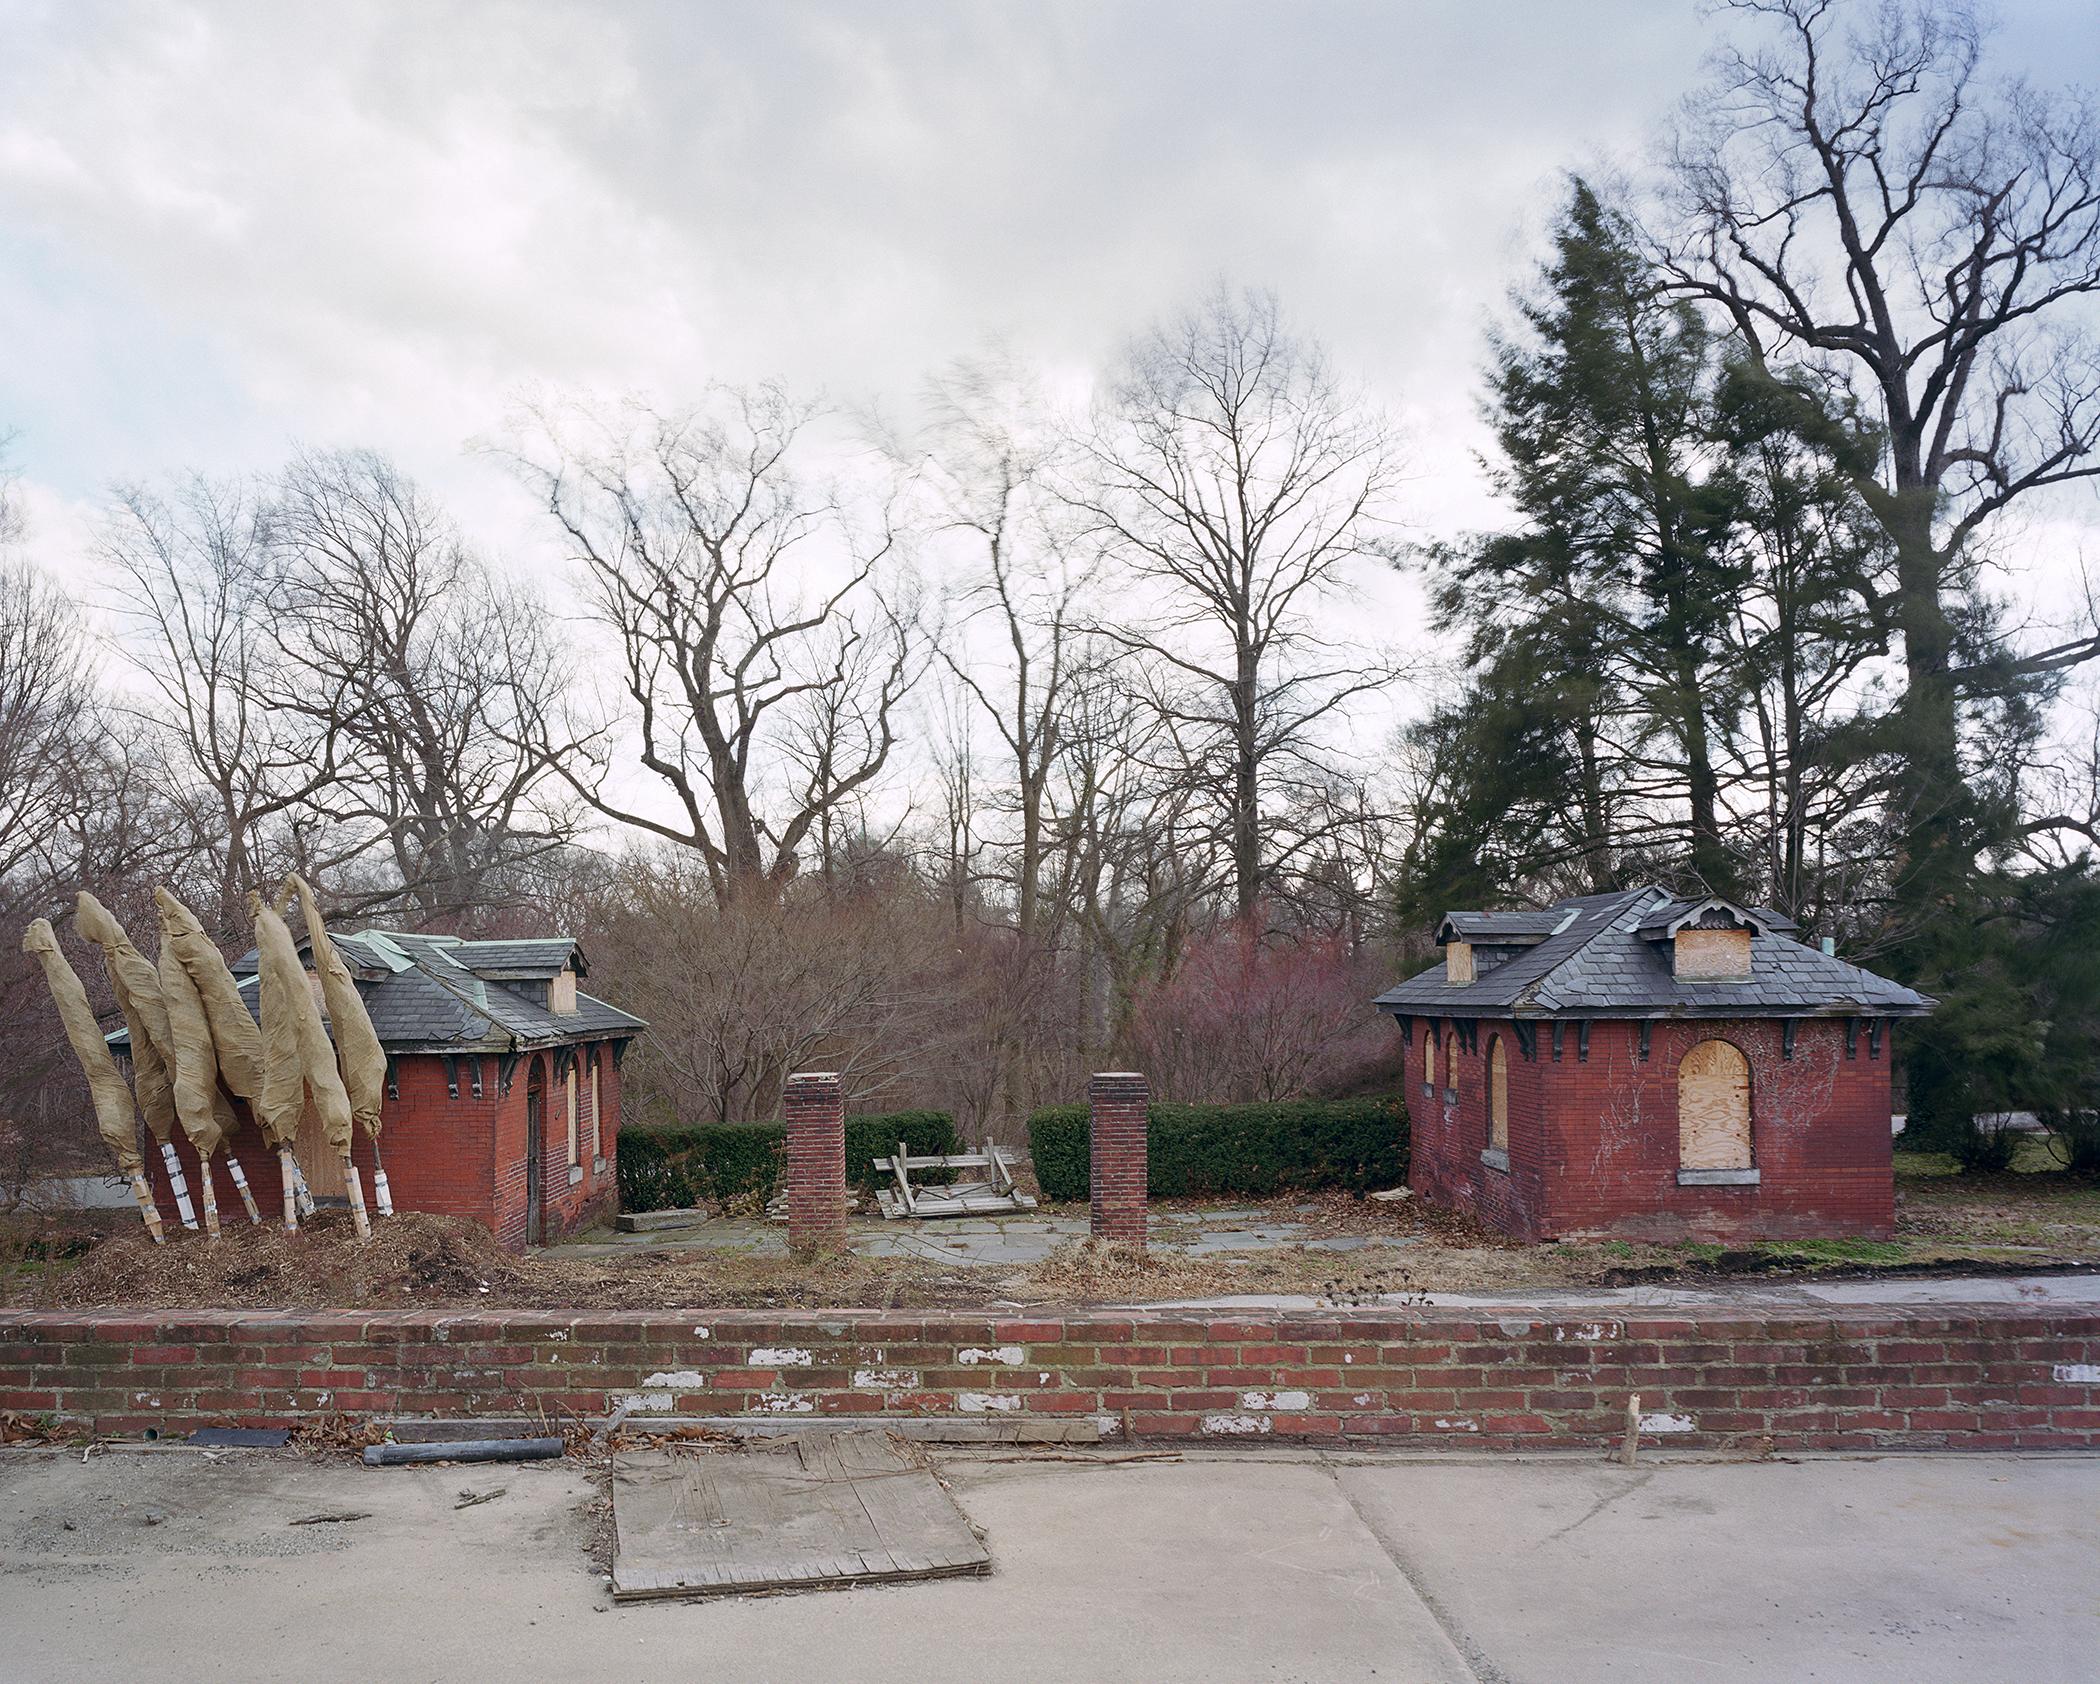 Lost-Utopias-Jade-Doskow-Front-Room-Gallery-Philadelphia-Washrooms.jpg